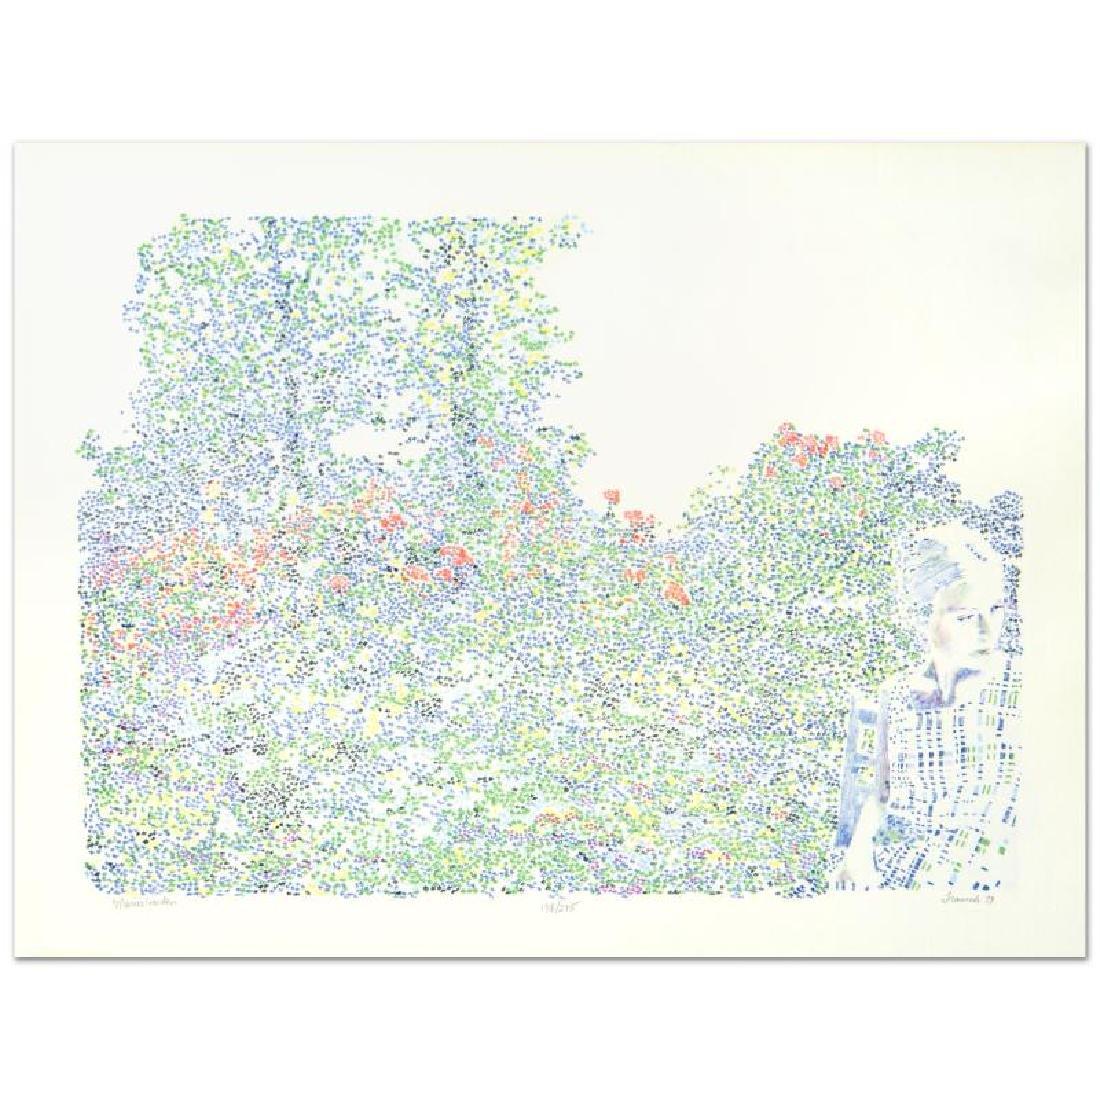 "Traudi Flaxman - ""Marie's Garden"" Limited Edition"